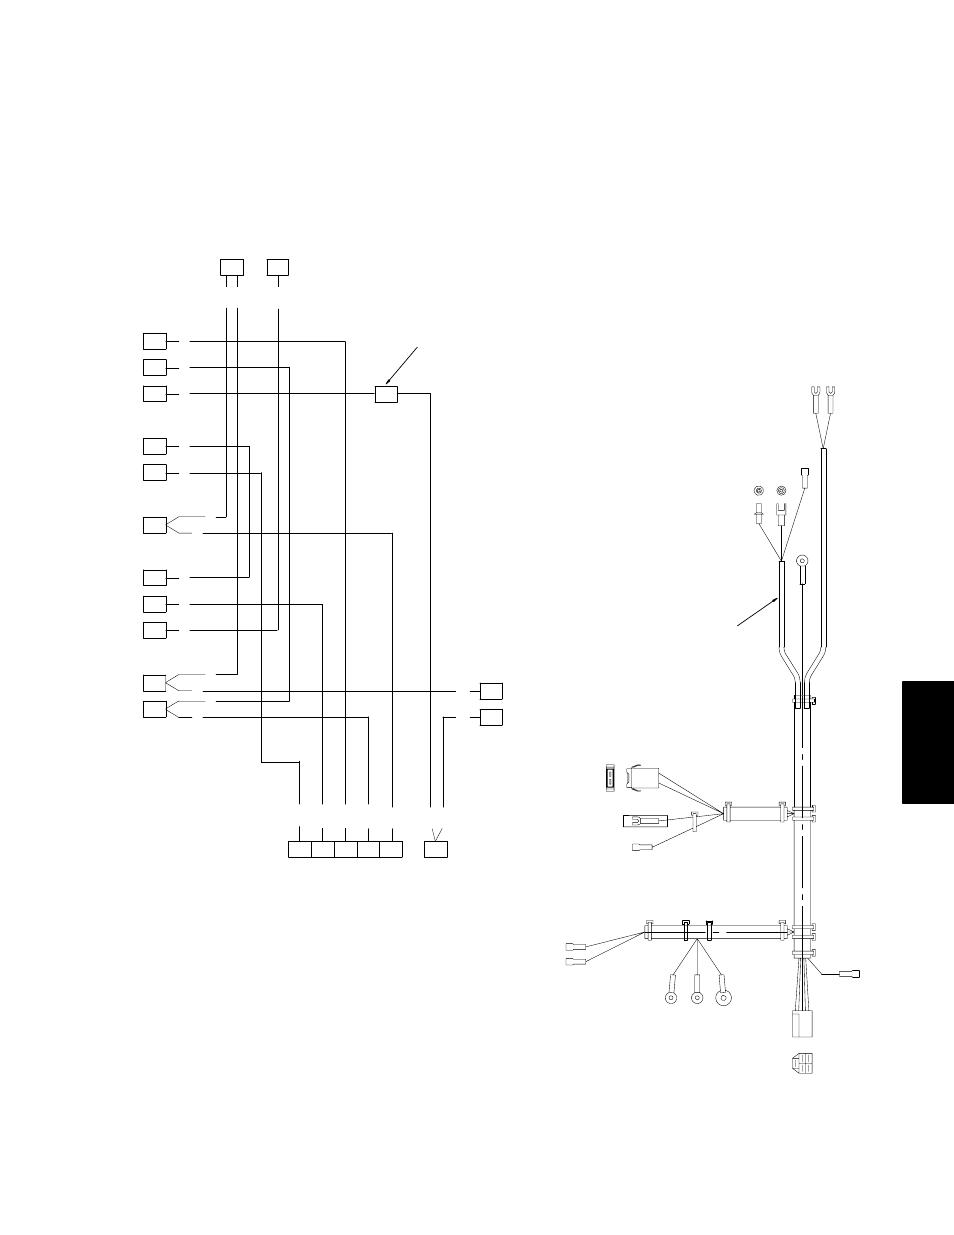 Intermatic Pool Transformer Wiring Intermatic Pool Relay